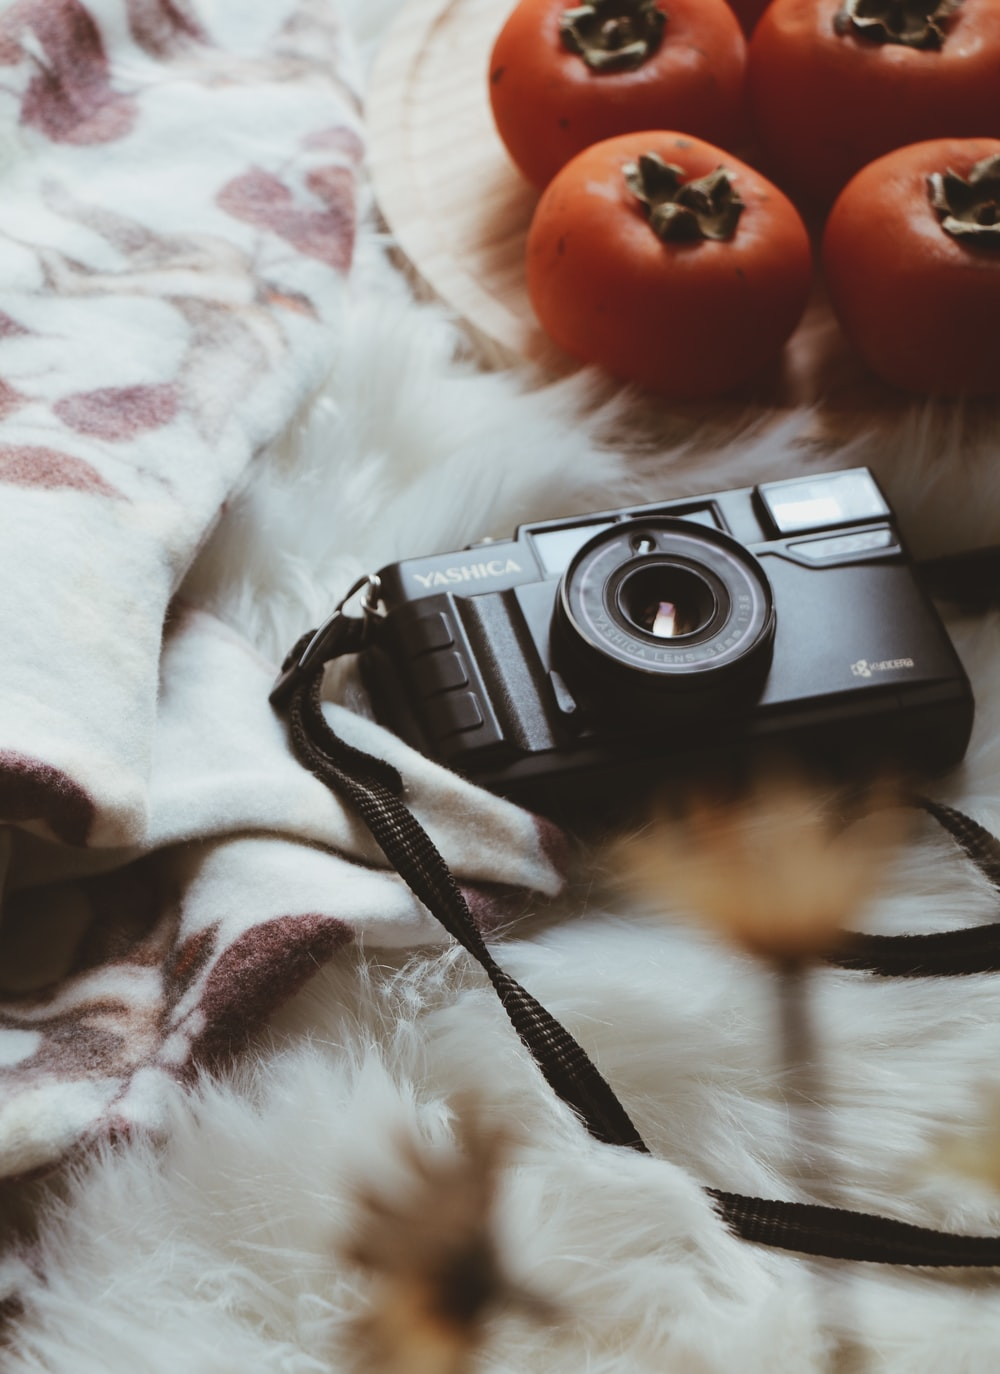 selective focus photo of black Yashica camera on white fur sheet